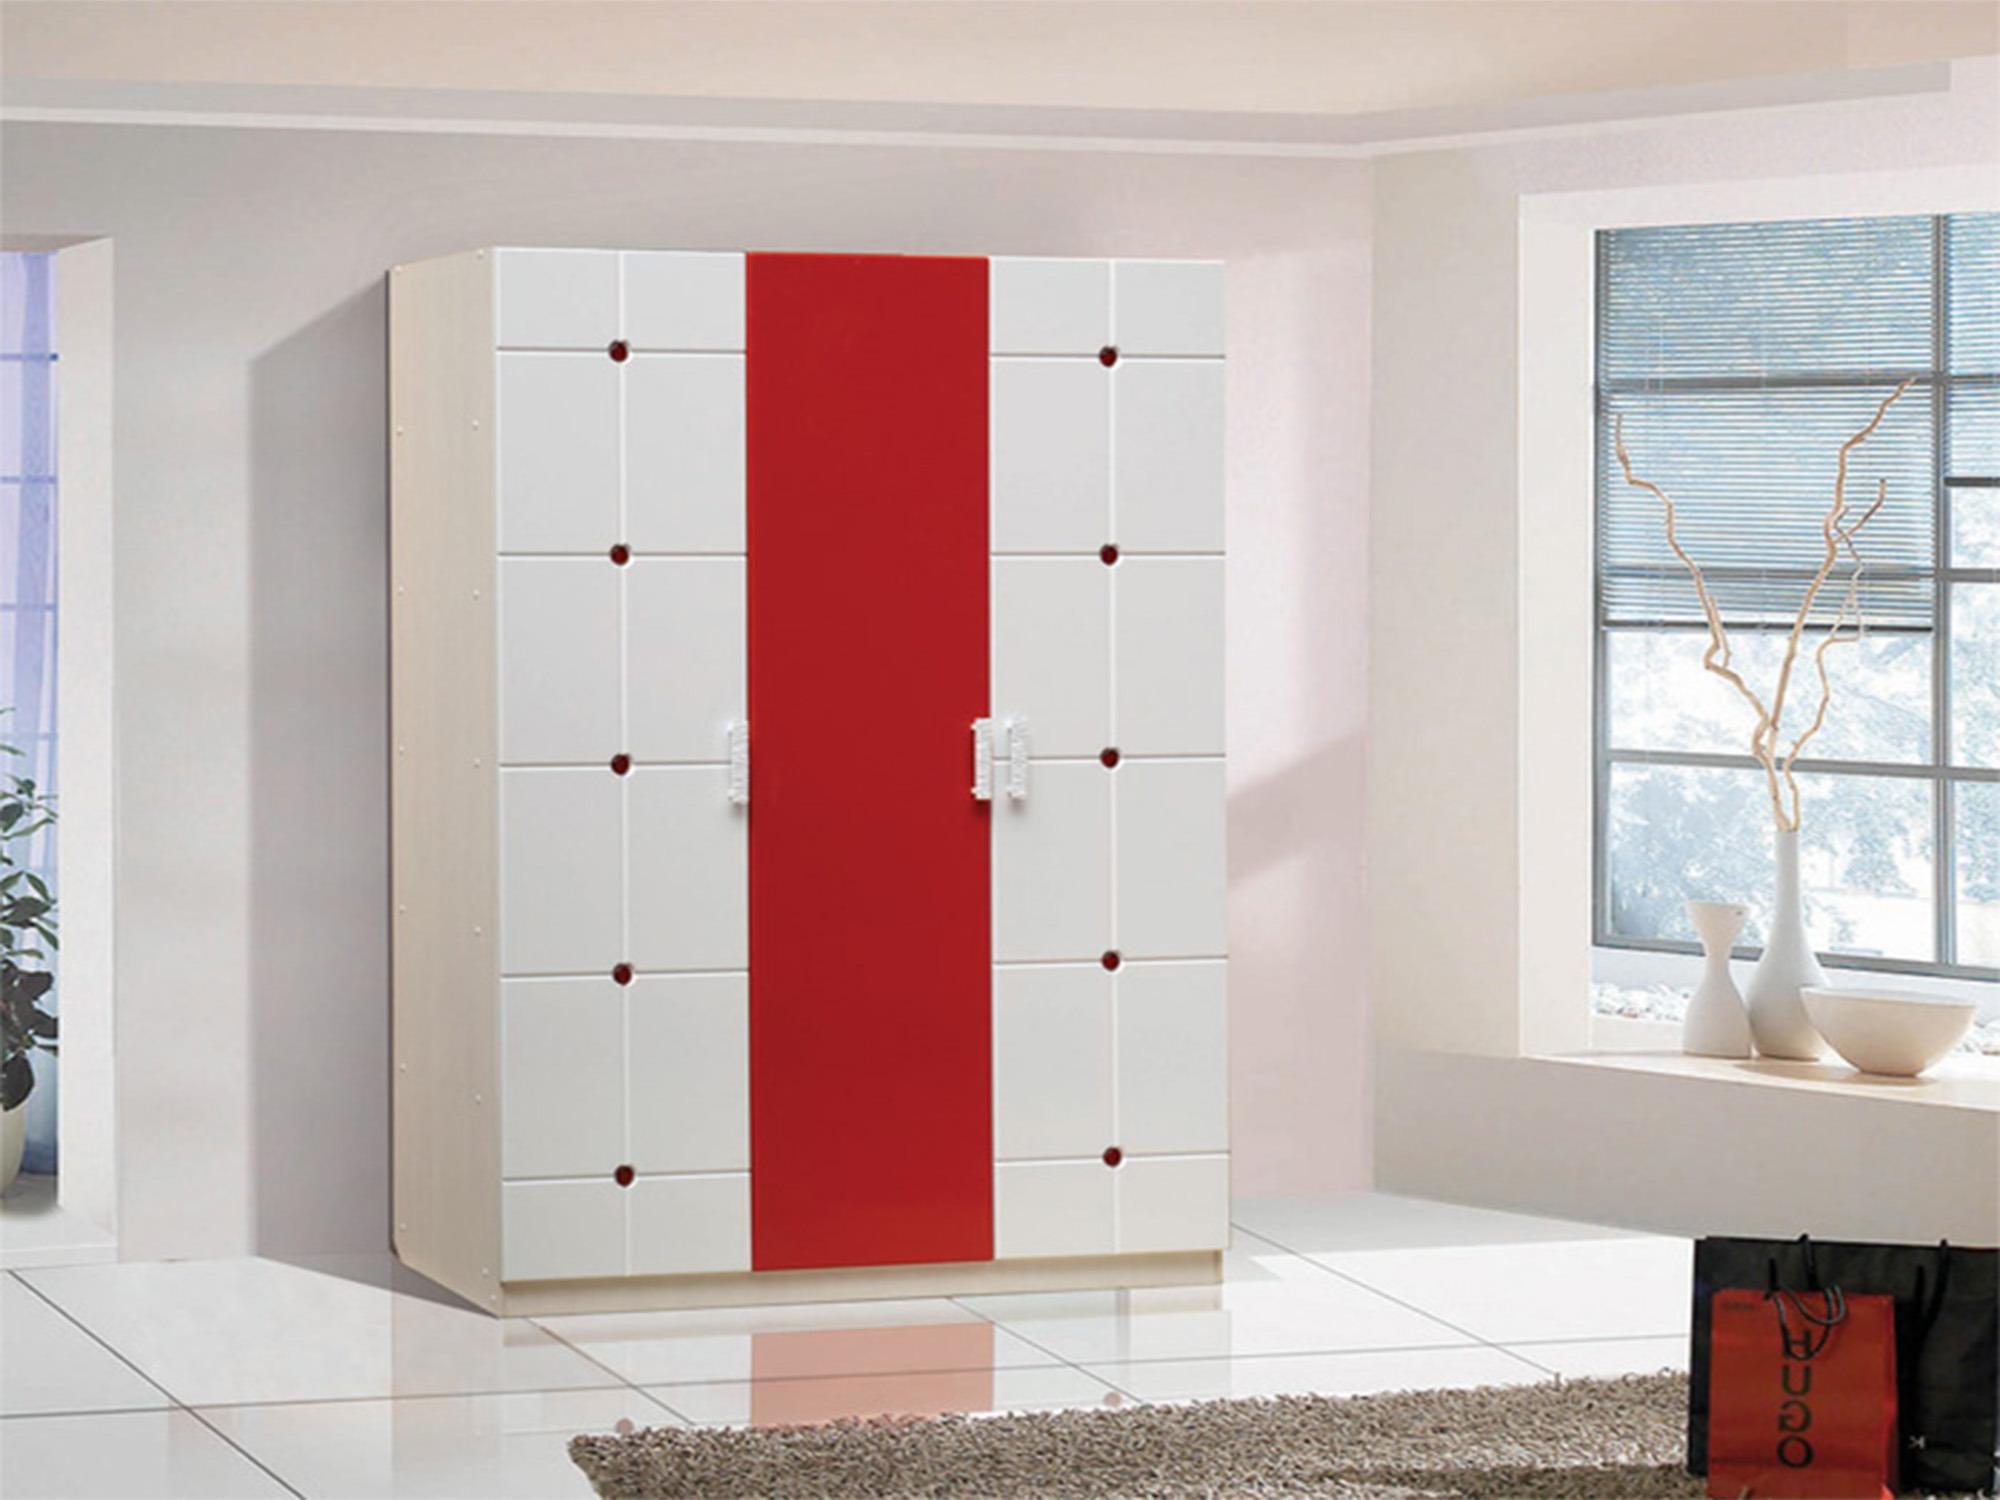 Шкаф 3 створчатый Лицей-1Шкафы<br><br><br>Длина мм: 1500<br>Высота мм: 2100<br>Глубина мм: 520